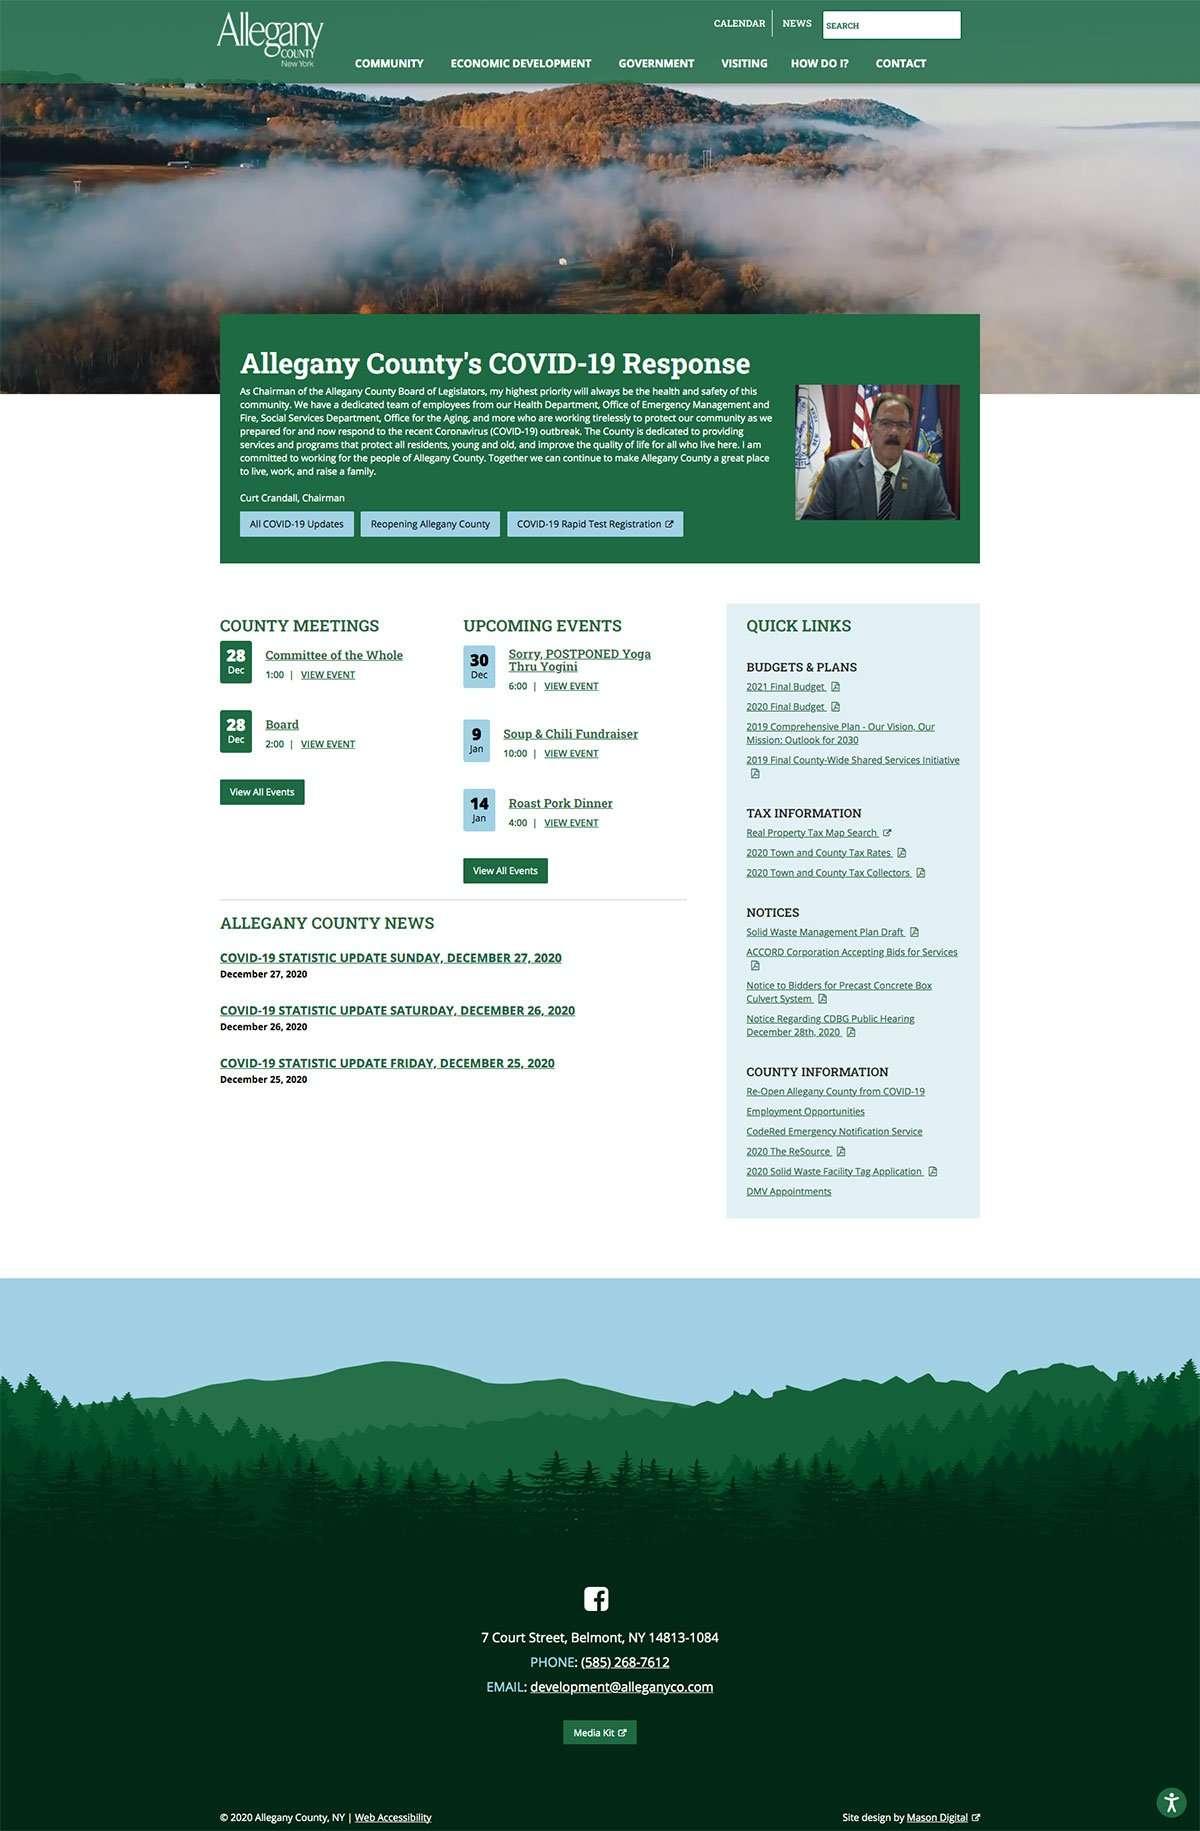 Allegany County